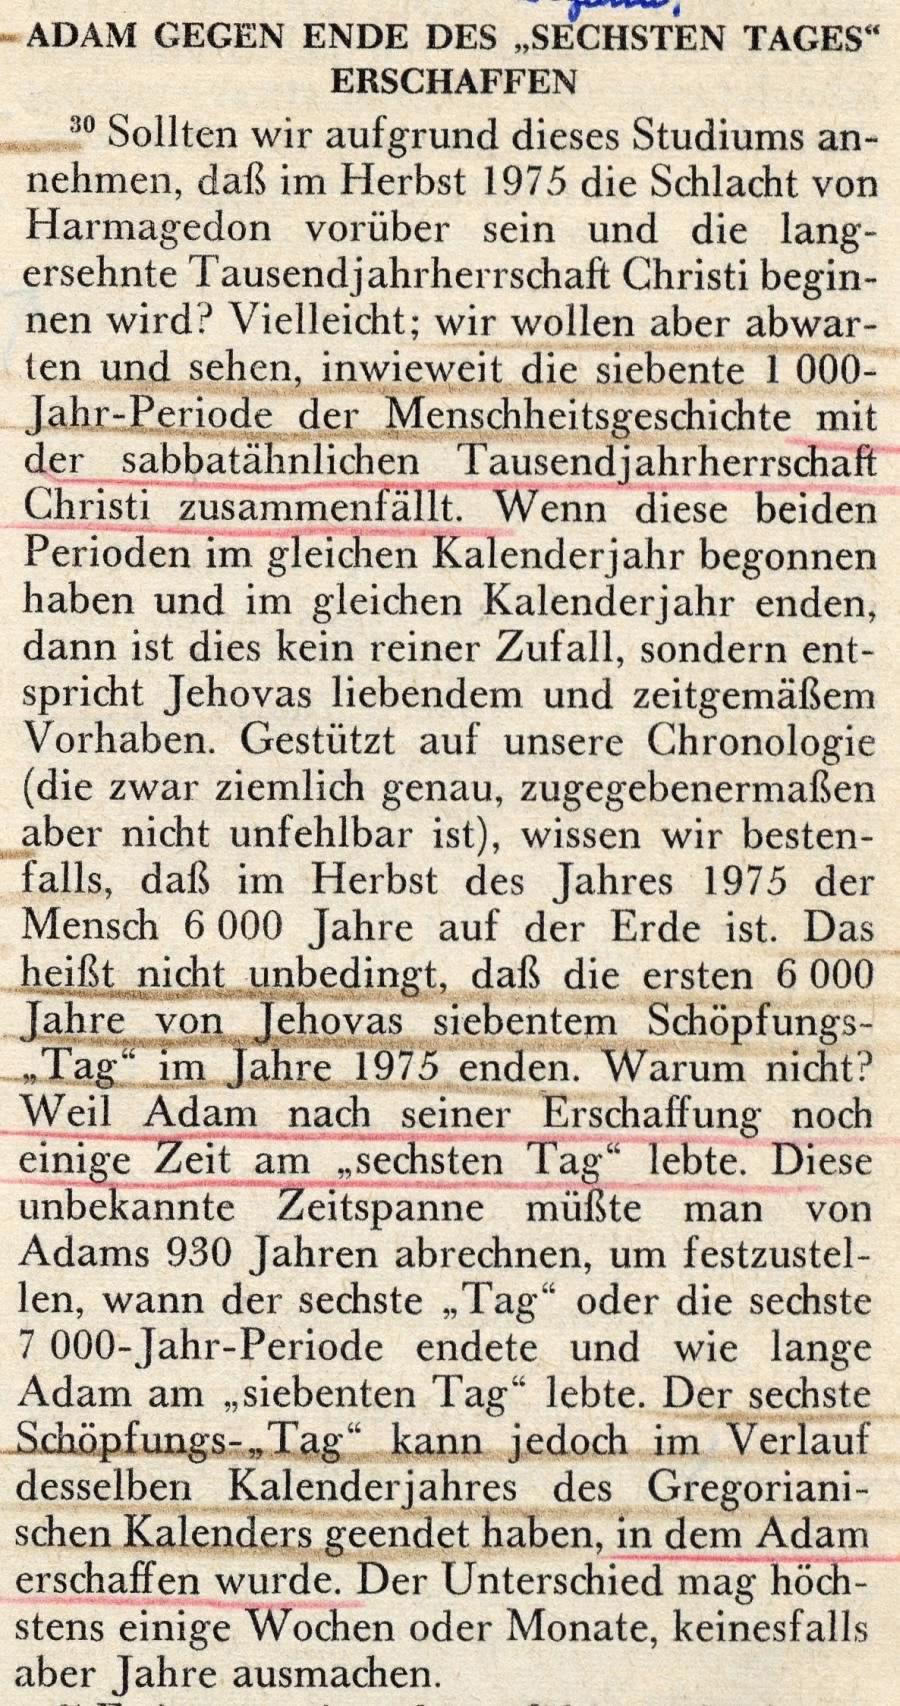 http://www.manfred-gebhard.de/1968wt1511691.jpg